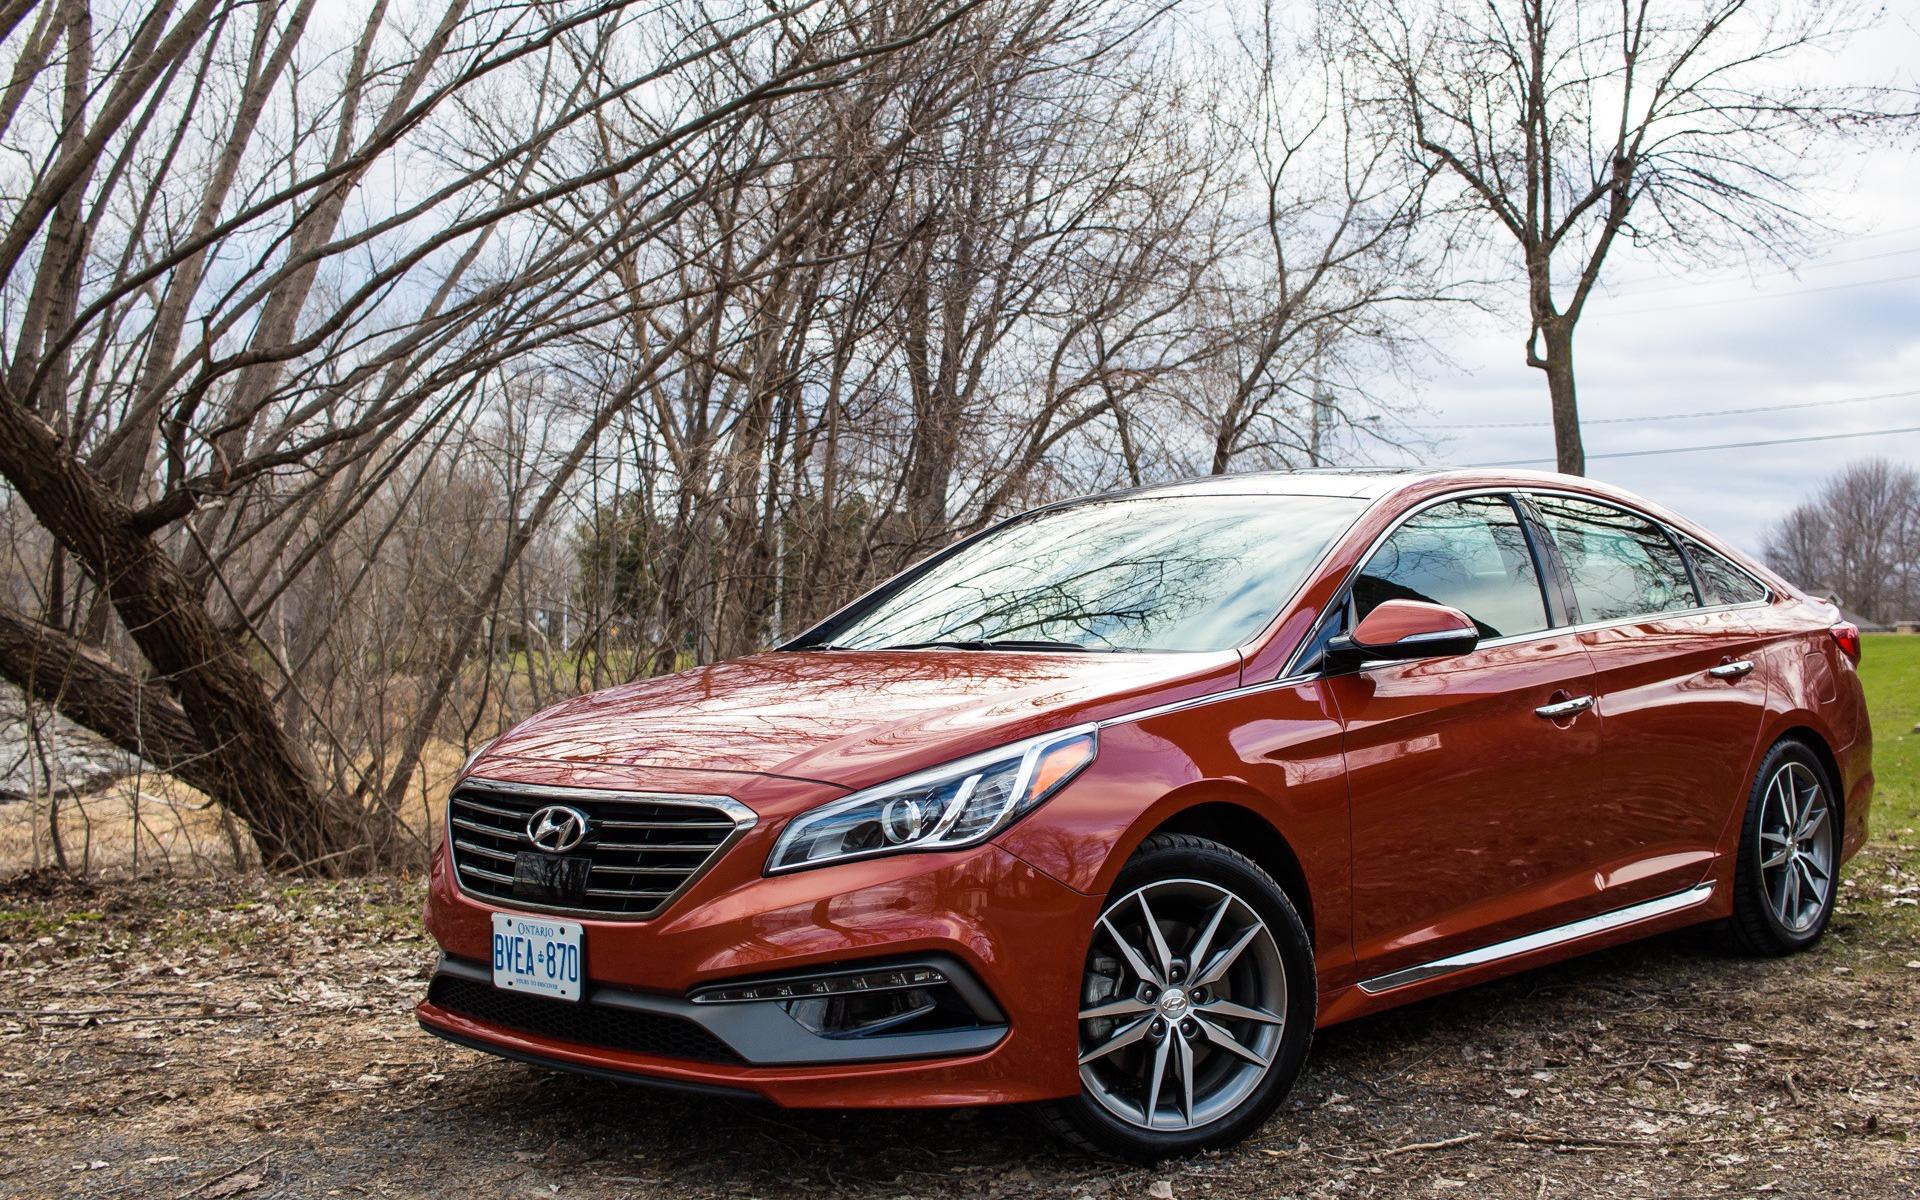 Hyundai Sonata 2015 - Un nouveau rappel